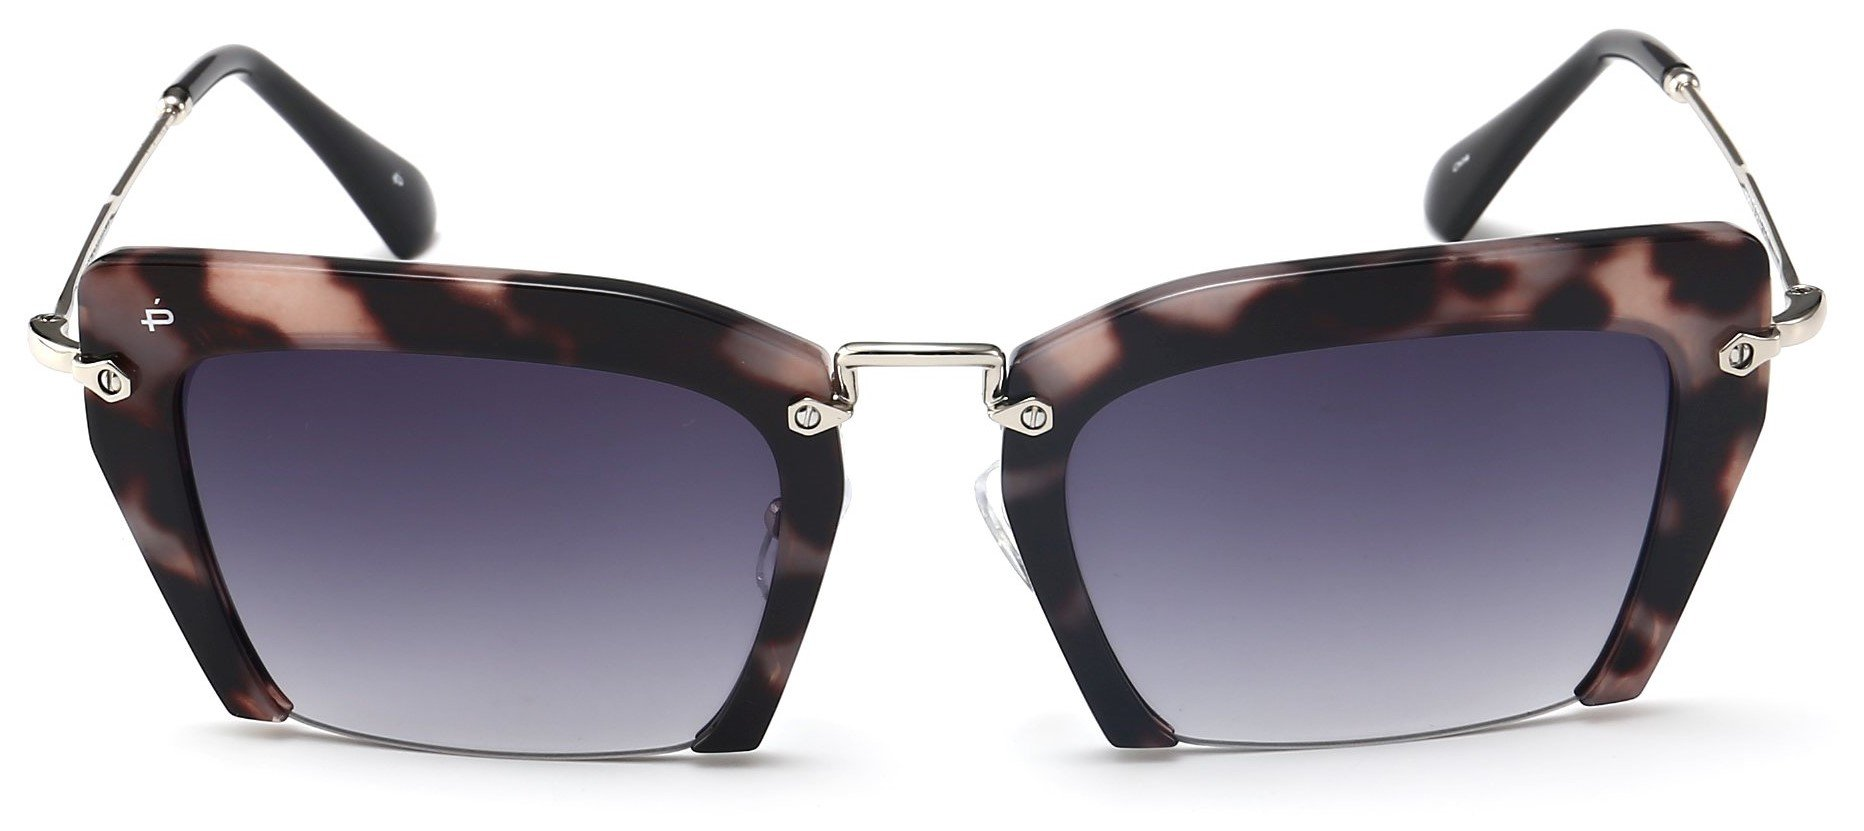 "ویکالا · خرید  اصل اورجینال · خرید از آمازون · PRIVÉ REVAUX ""The Socialite"" Handcrafted Designer Cut Off Sunglasses For Women wekala · ویکالا"